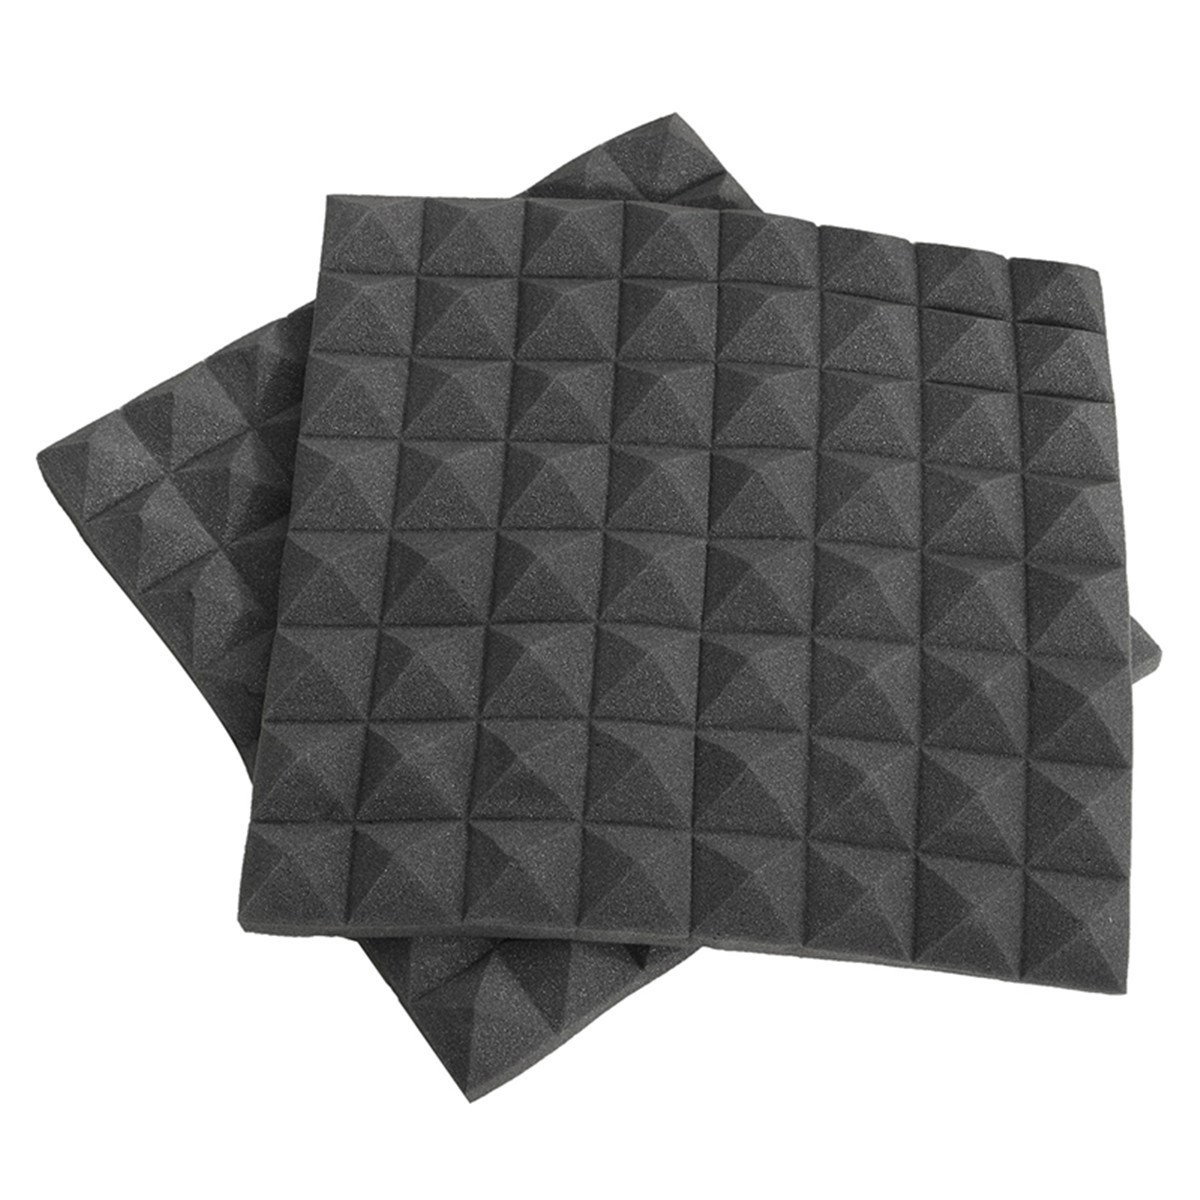 Hot Sale 2Pcs Soundproofing Foams Acoustic Wedge Studio Foam Sound Absorption Wall Panels 50cm*50cm*5cm Polyurethane foam(China (Mainland))